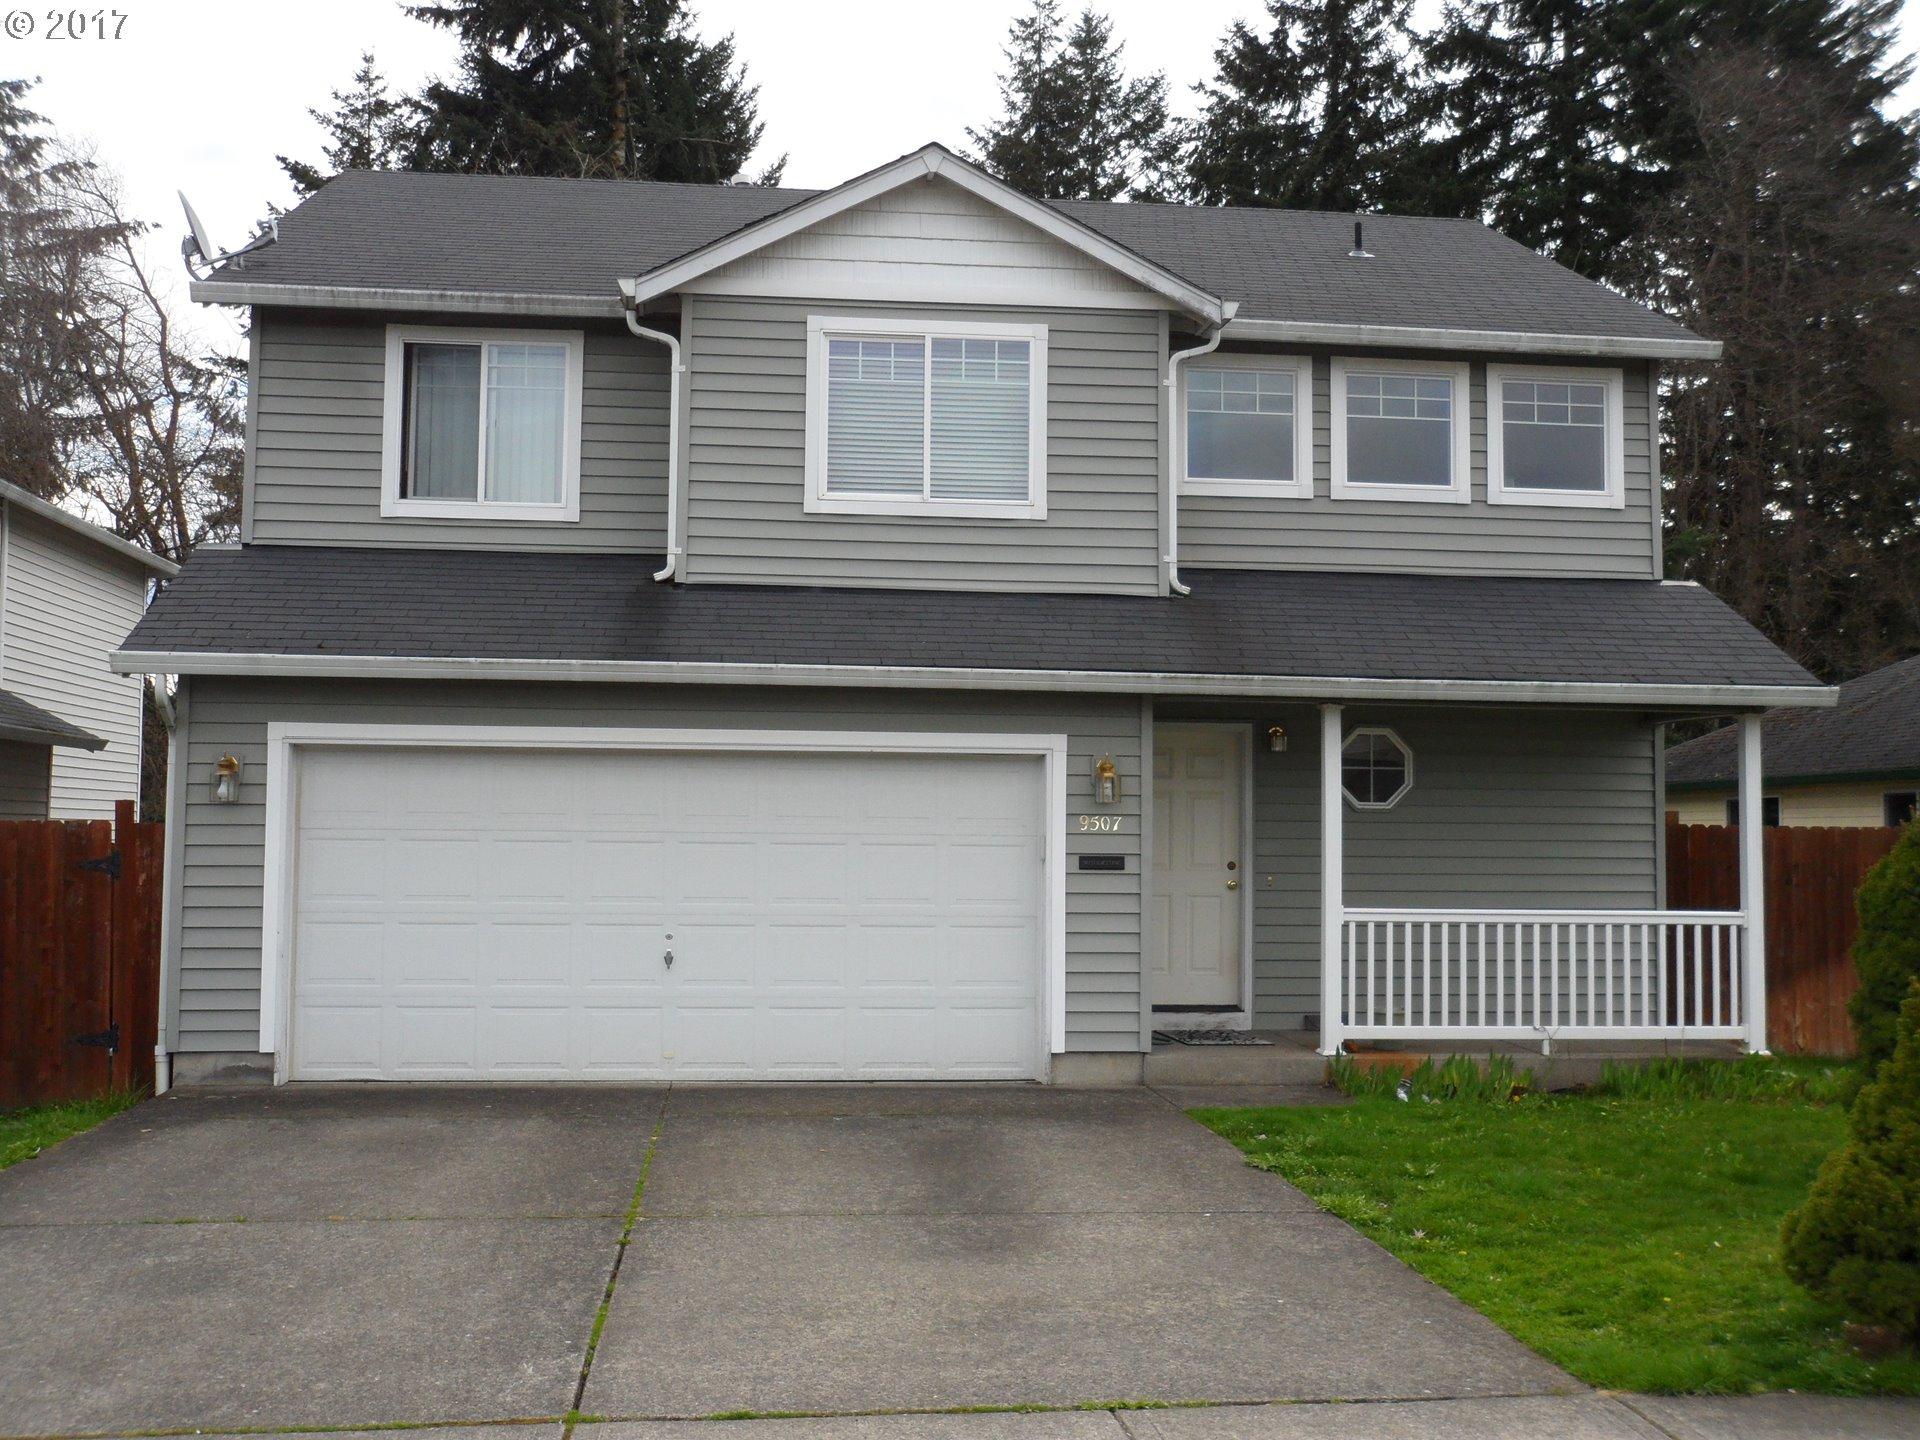 9507 NE 41ST AVE, Vancouver, WA 98665